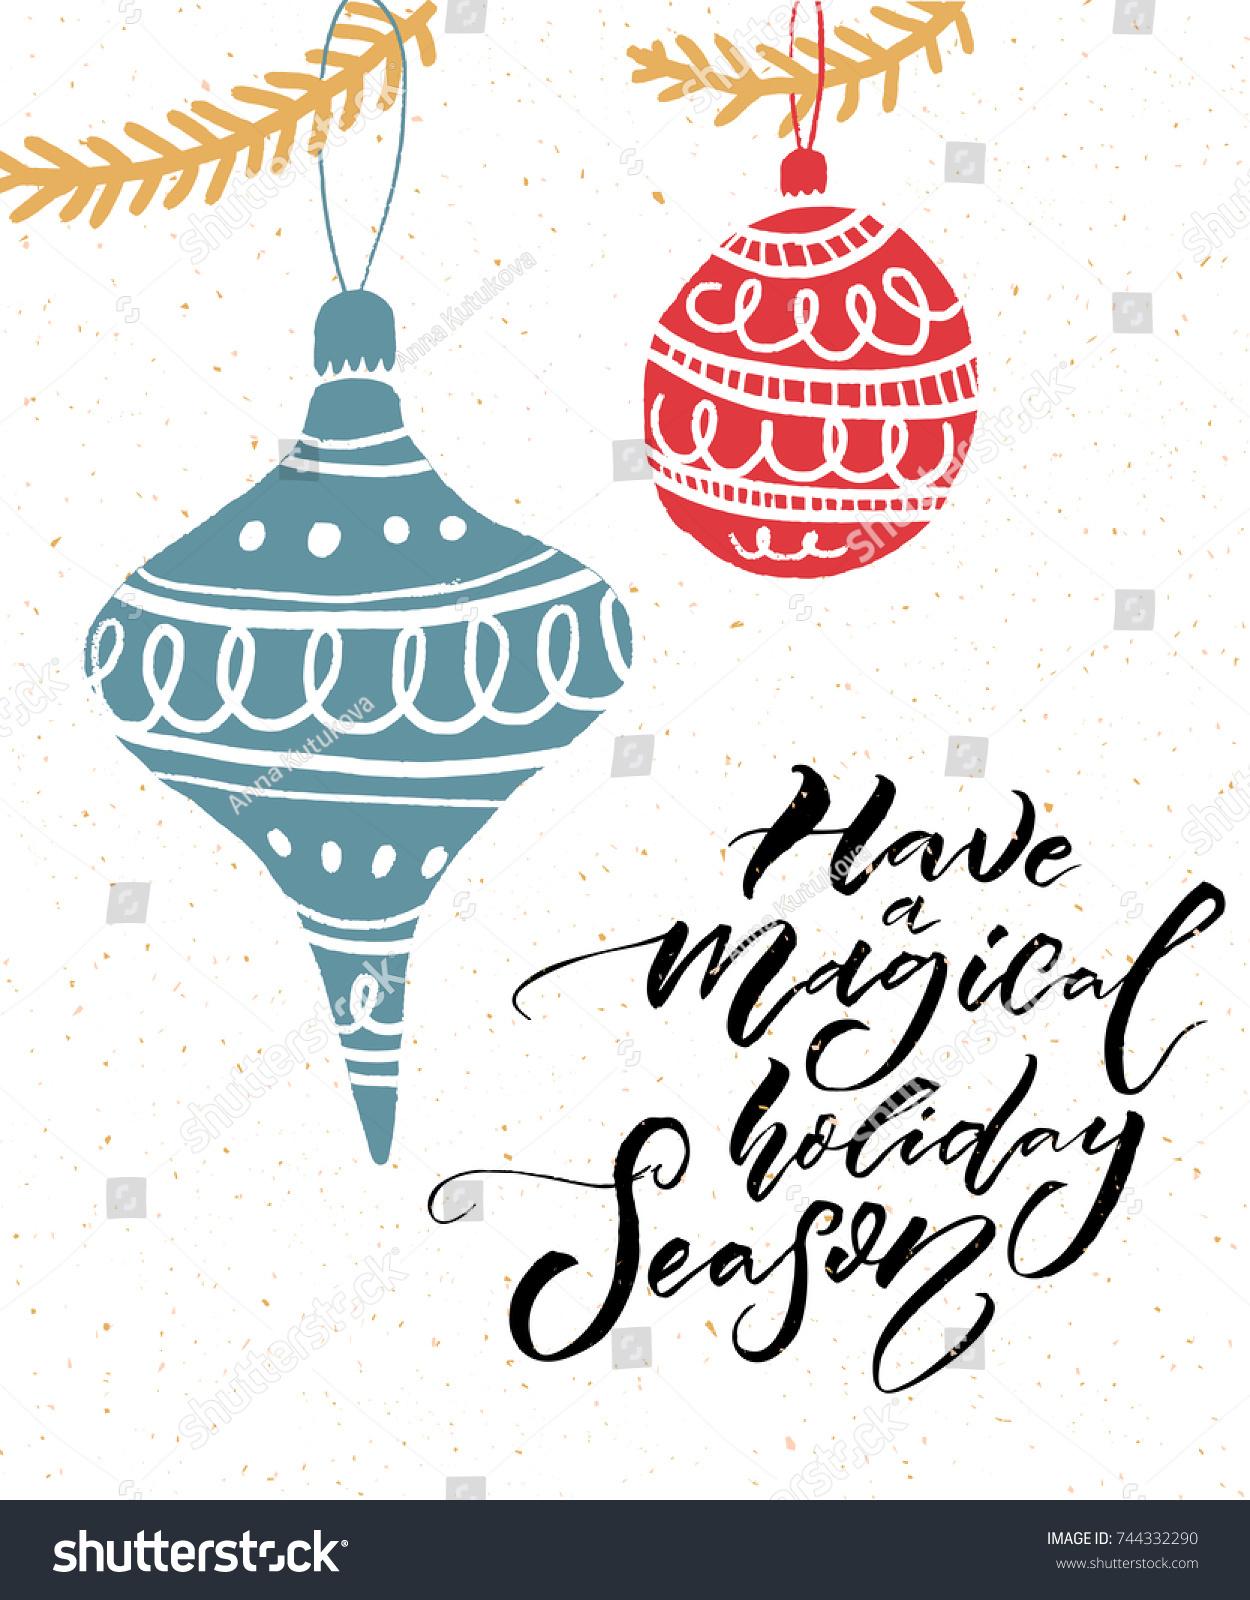 Have Magical Holiday Season Inspirational Calligraphy Stock Vector ...